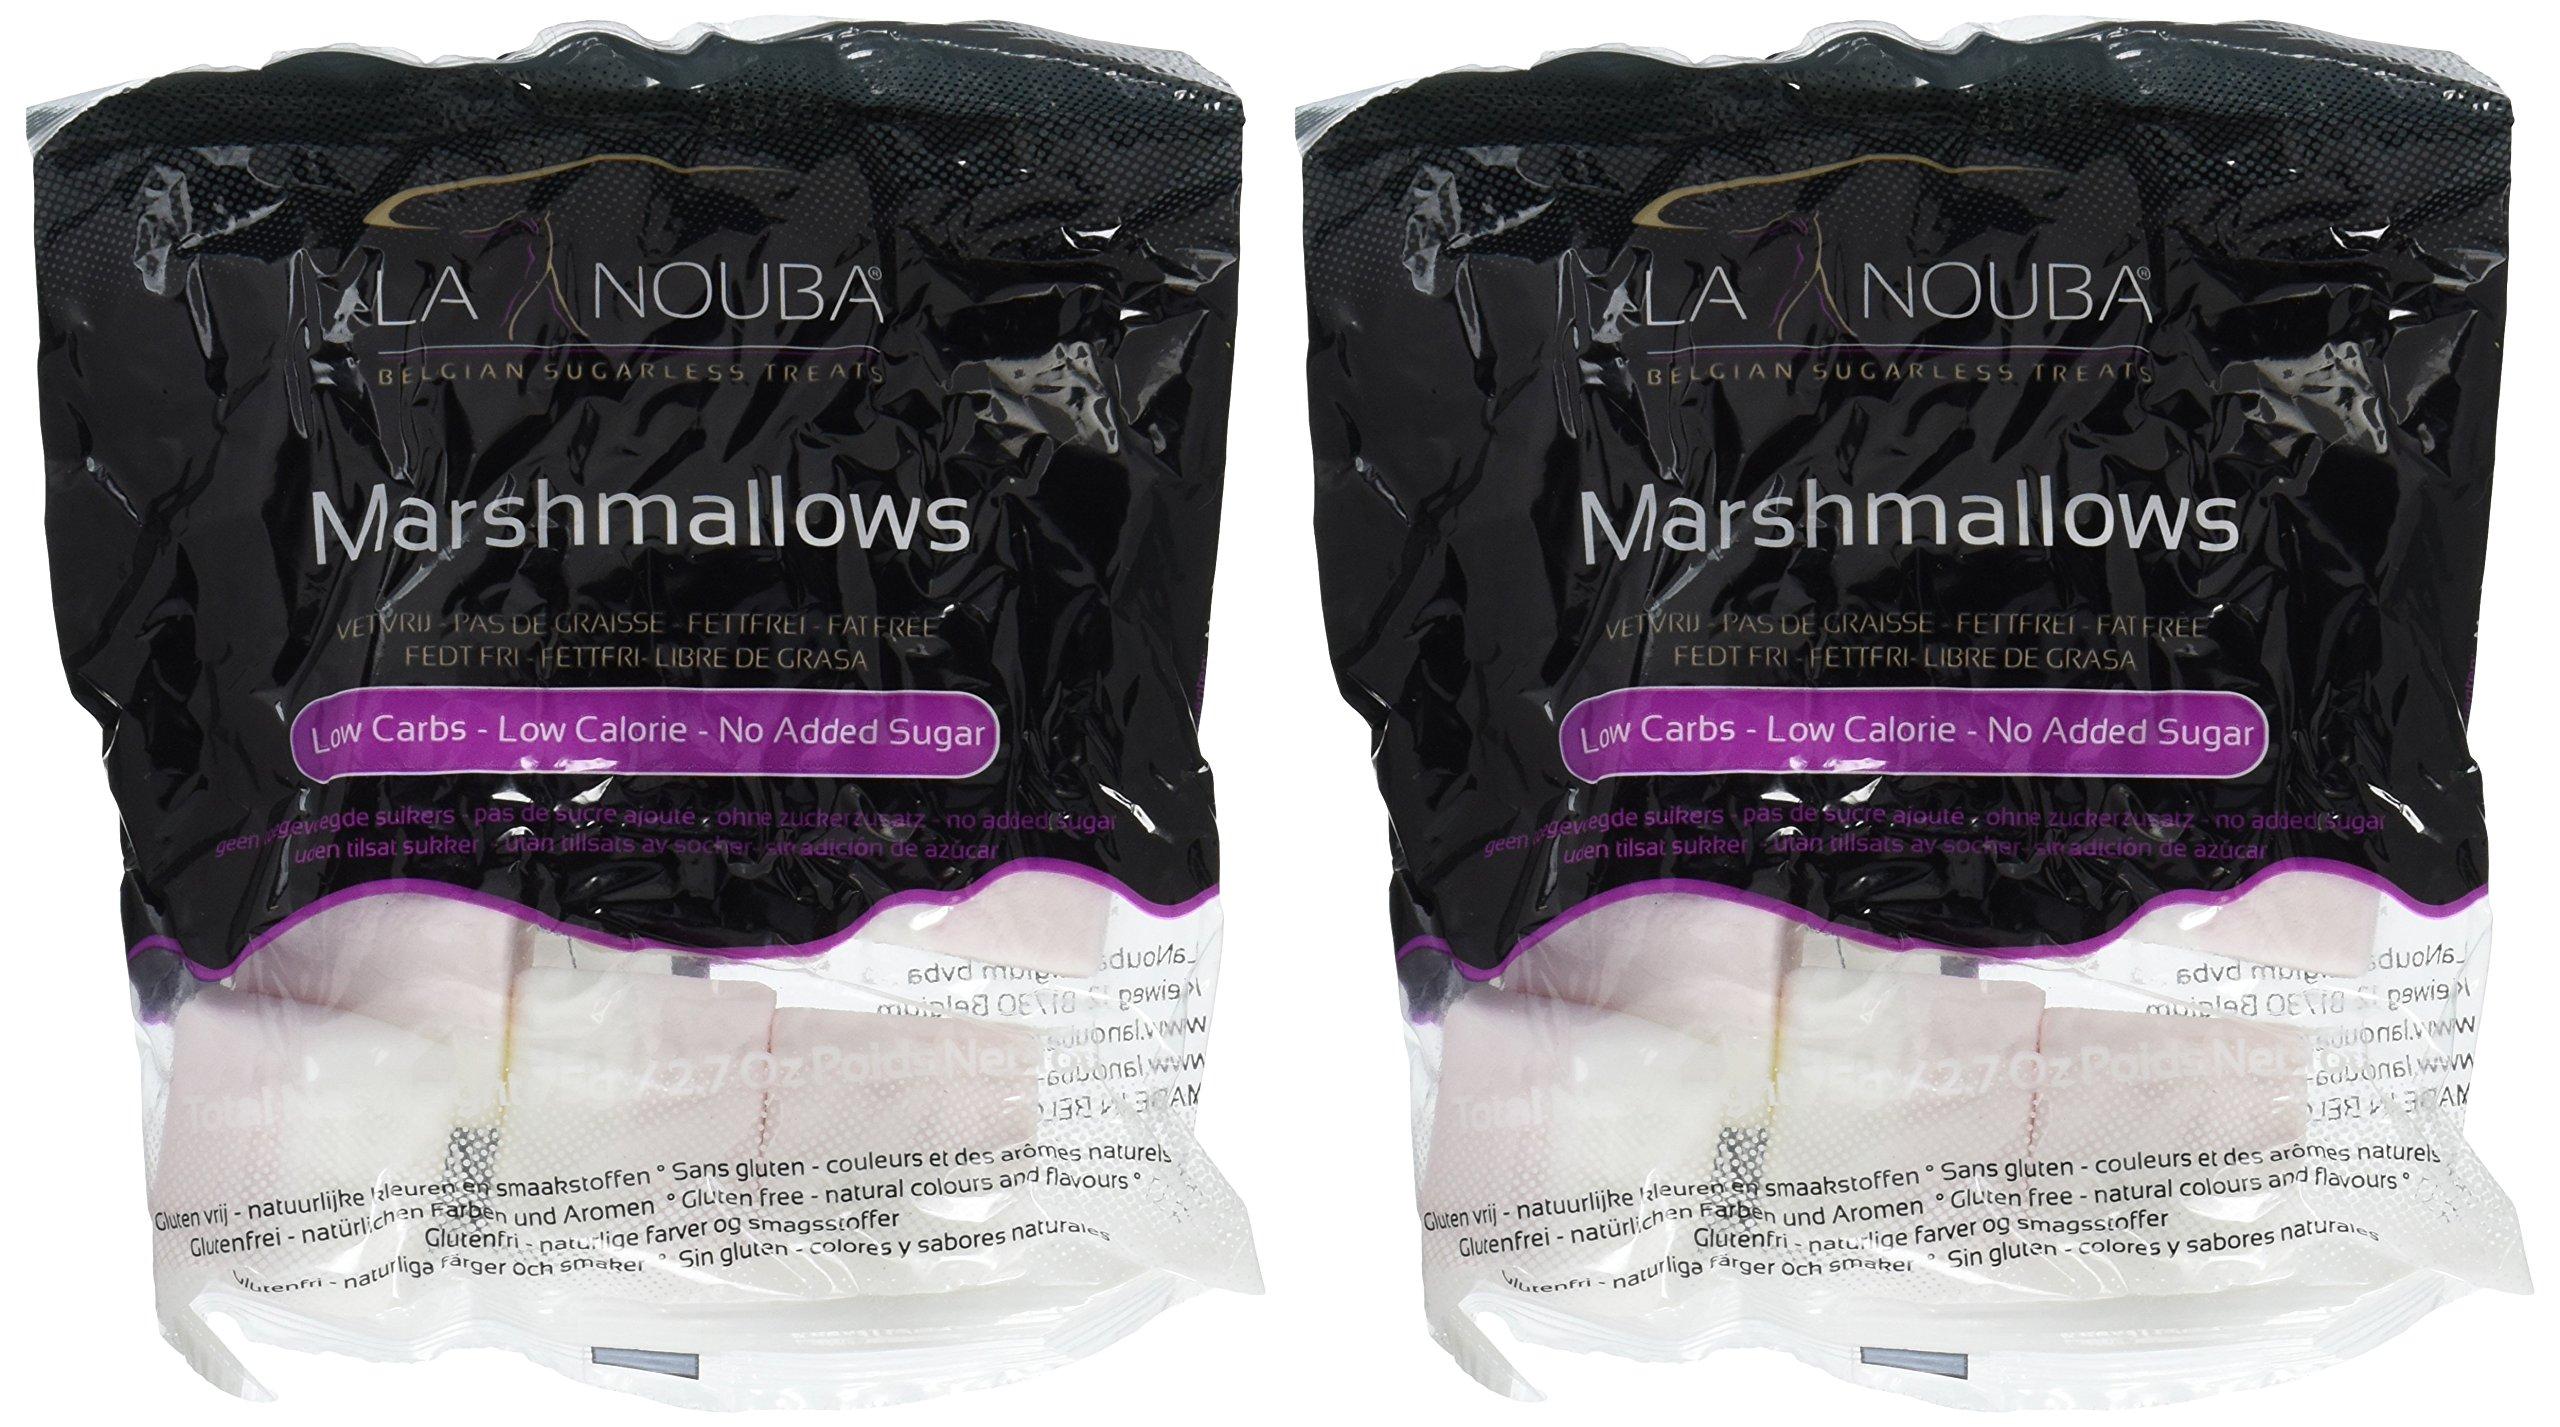 2 Pack Value: La Nouba, Sugar Free Marshmallow, Fat Free Gluten Free, 5.4 oz. by La Nouba (Image #2)